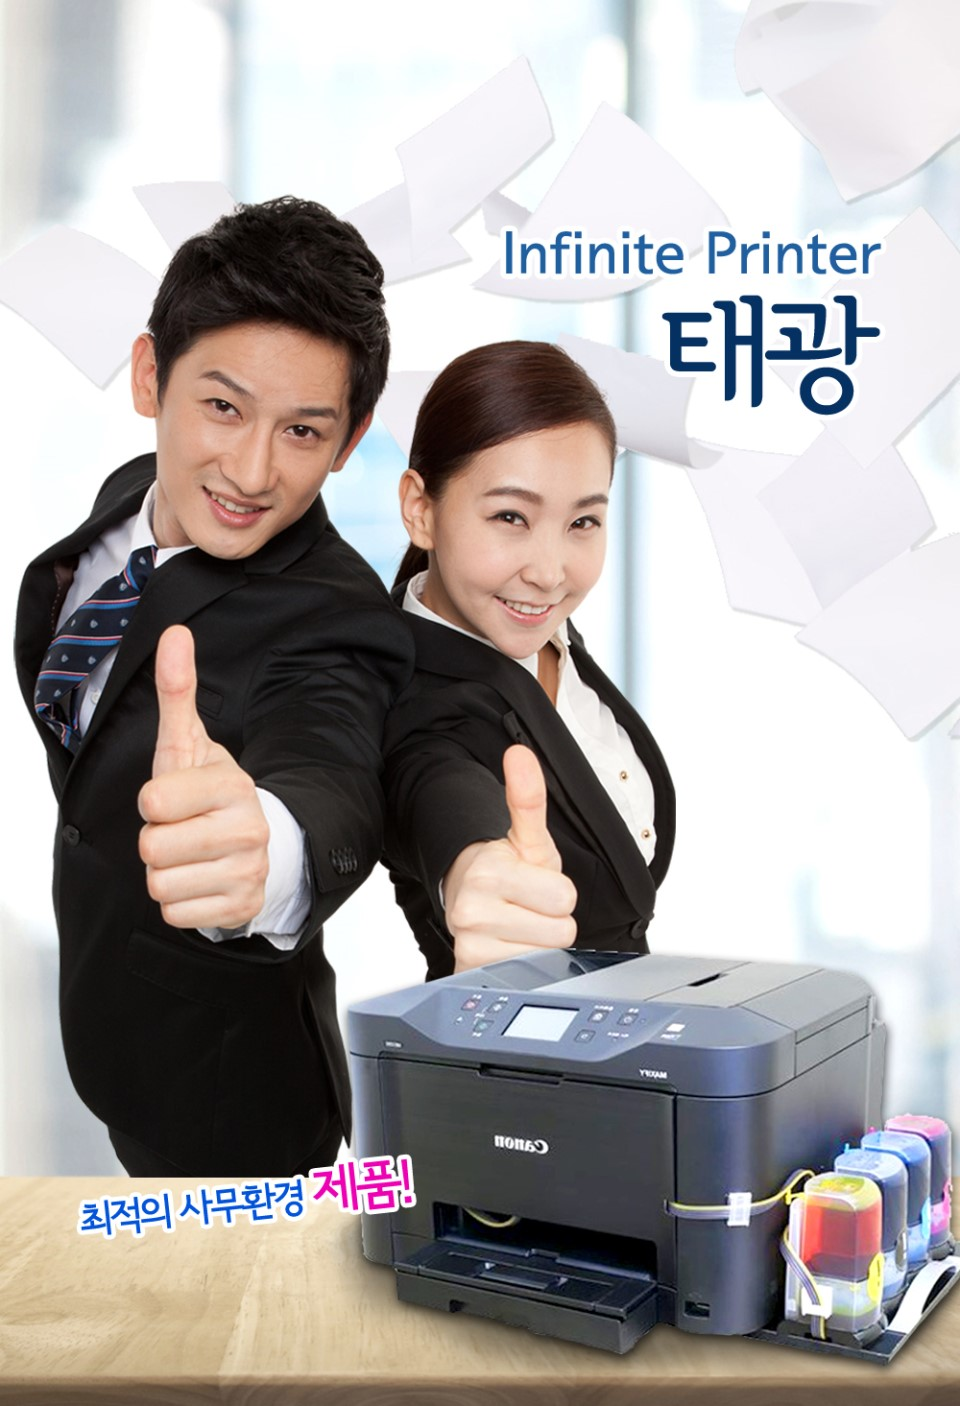 Infinite Printer 태광입니다.